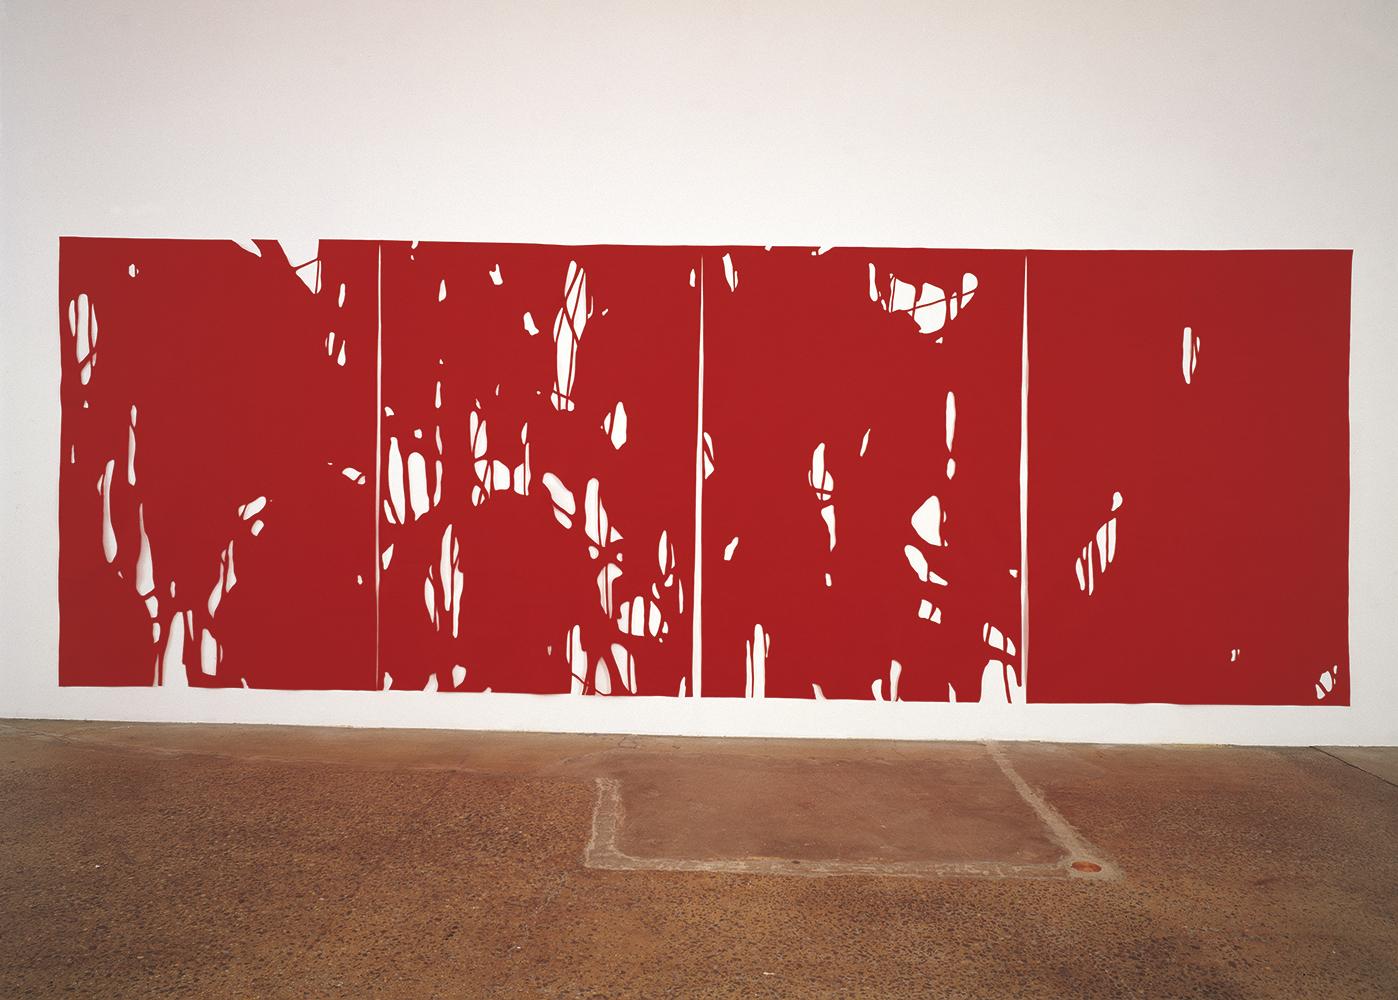 Behind the House III, 1999, Wool felt, 259 x 751 cm